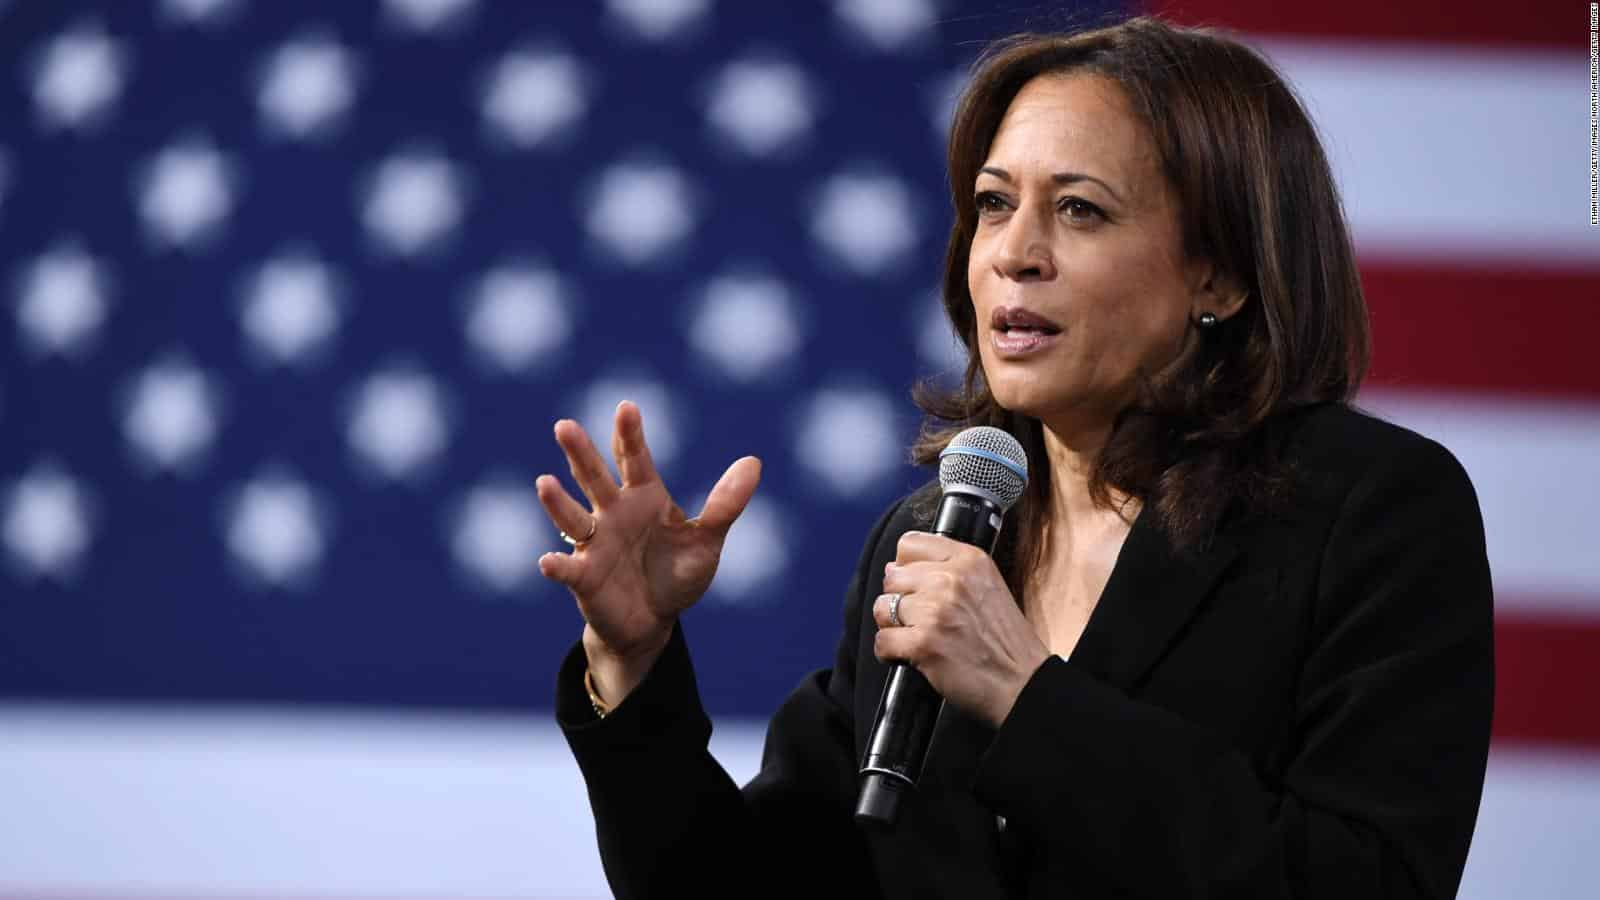 Joe Biden, Kamala Harris to make unusual campaign debut in coronavirus era